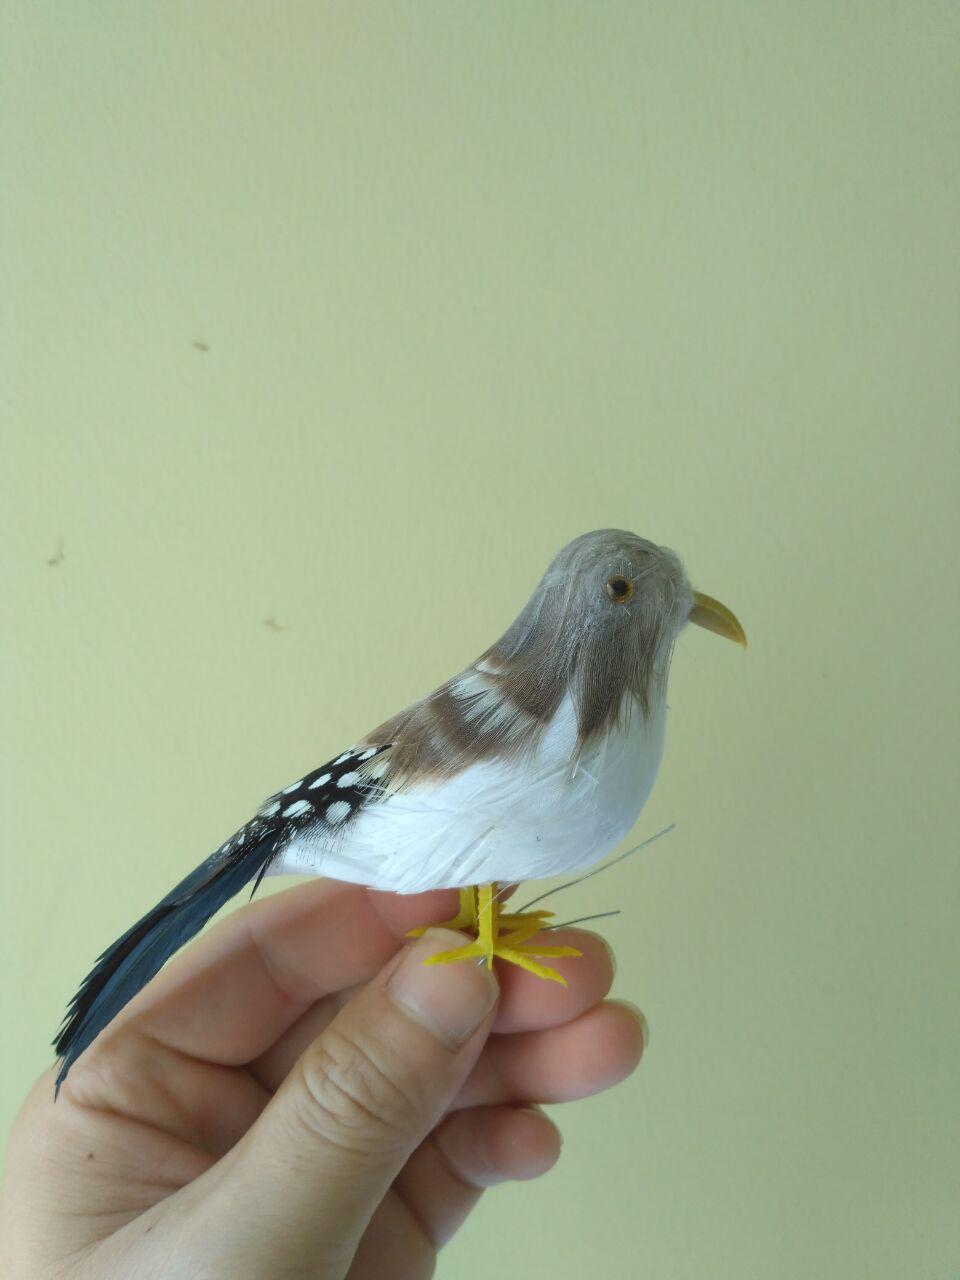 mini gray feathers Zebra Finch bird foam&feathers bird about 12cm игрушка ecx ruckus gray blue ecx00013t1